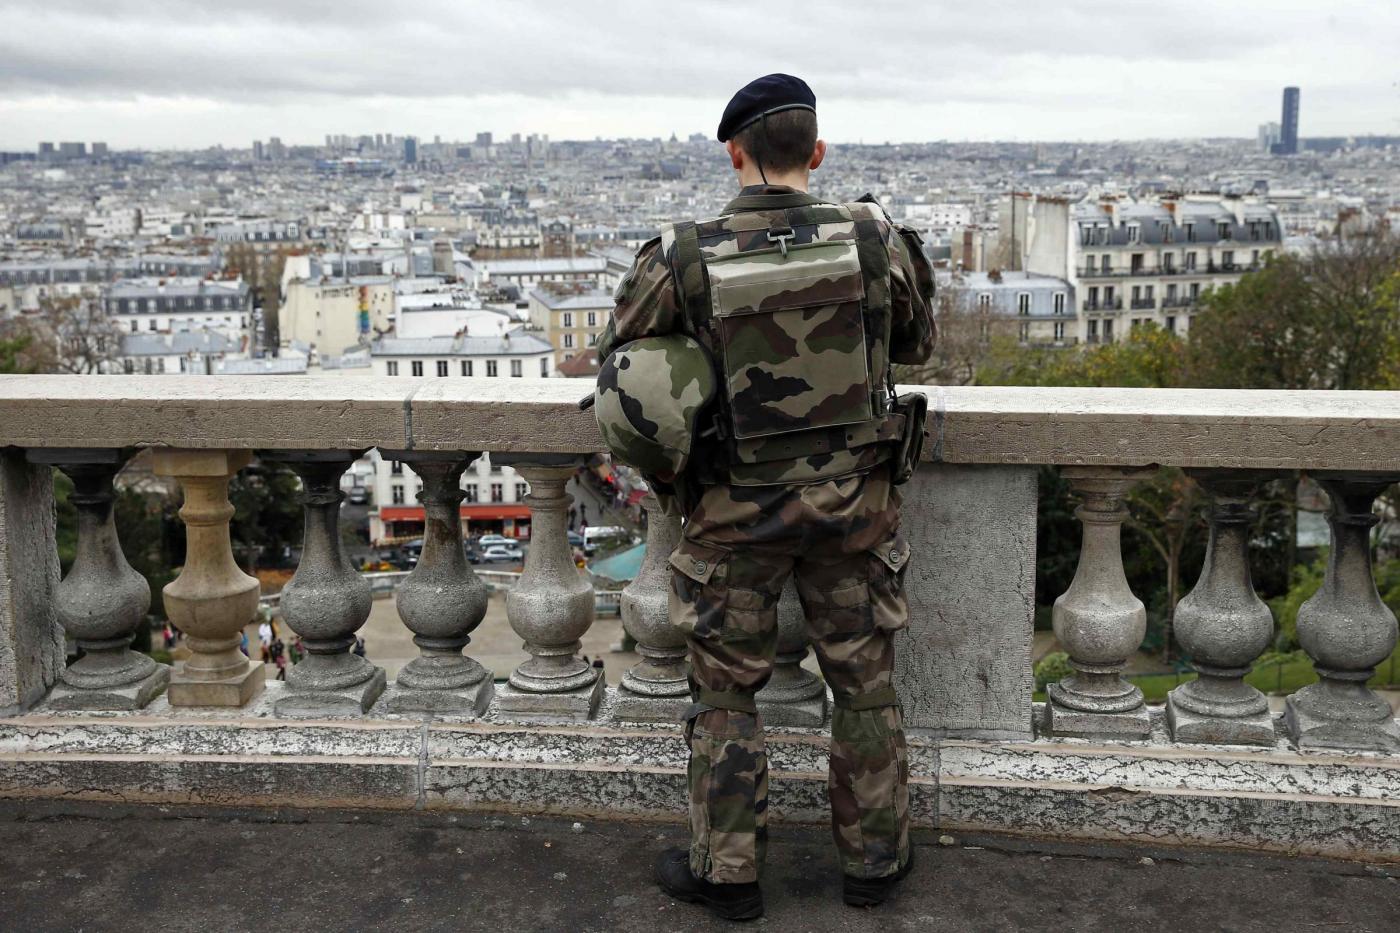 Attentati Parigi 2015: Nostradamus aveva predetto